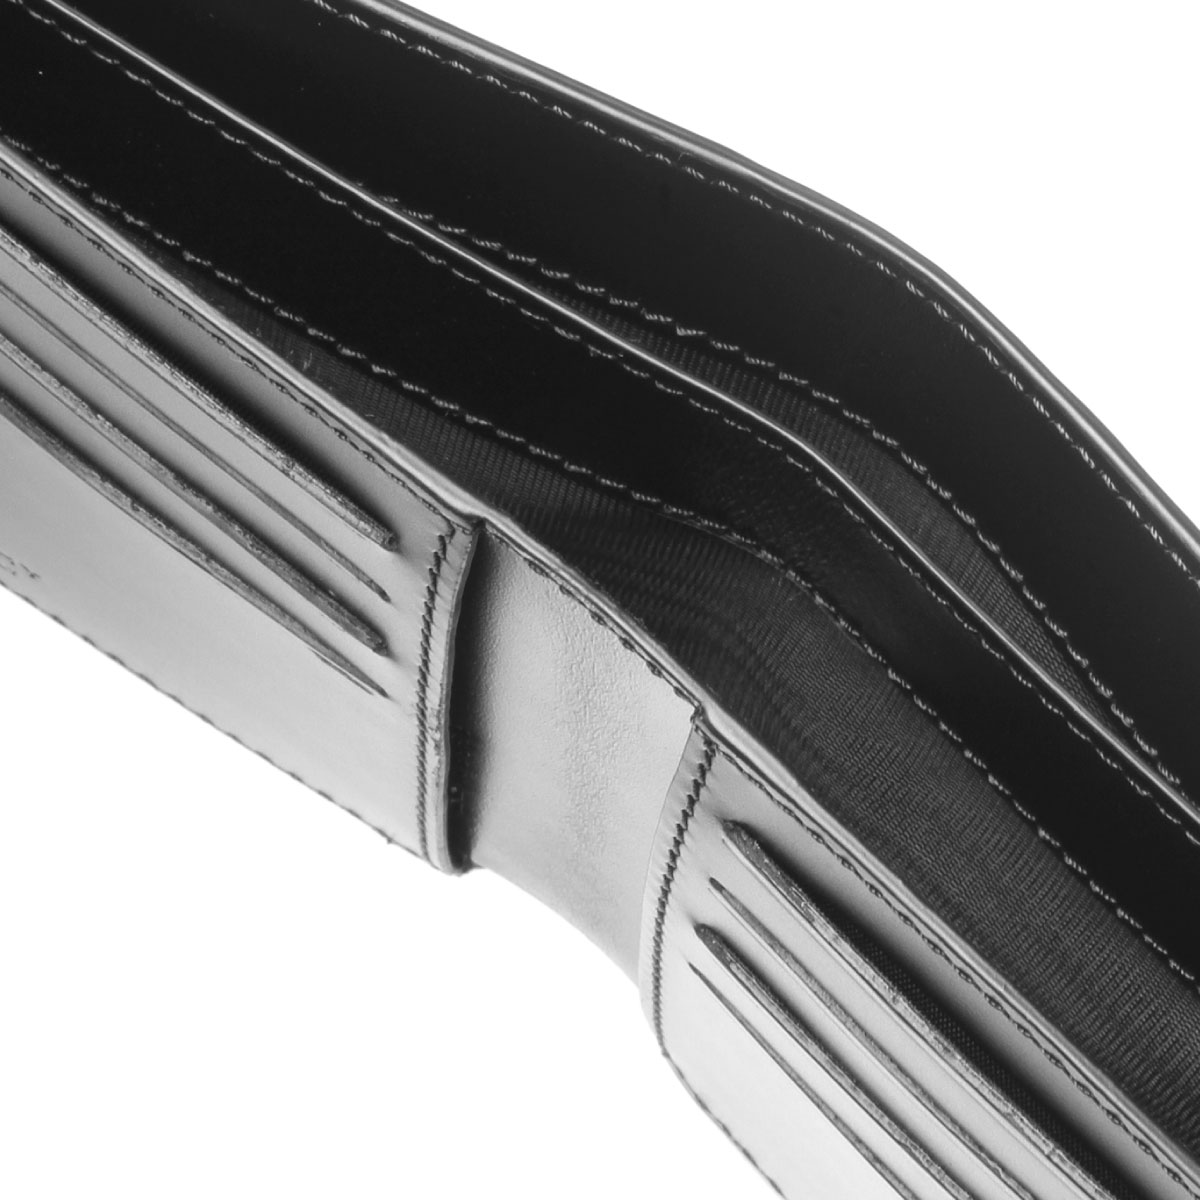 bb65fa08 Givenchy GIVENCHY wallet men BK6005K0C7 001 folio wallet BLACK black